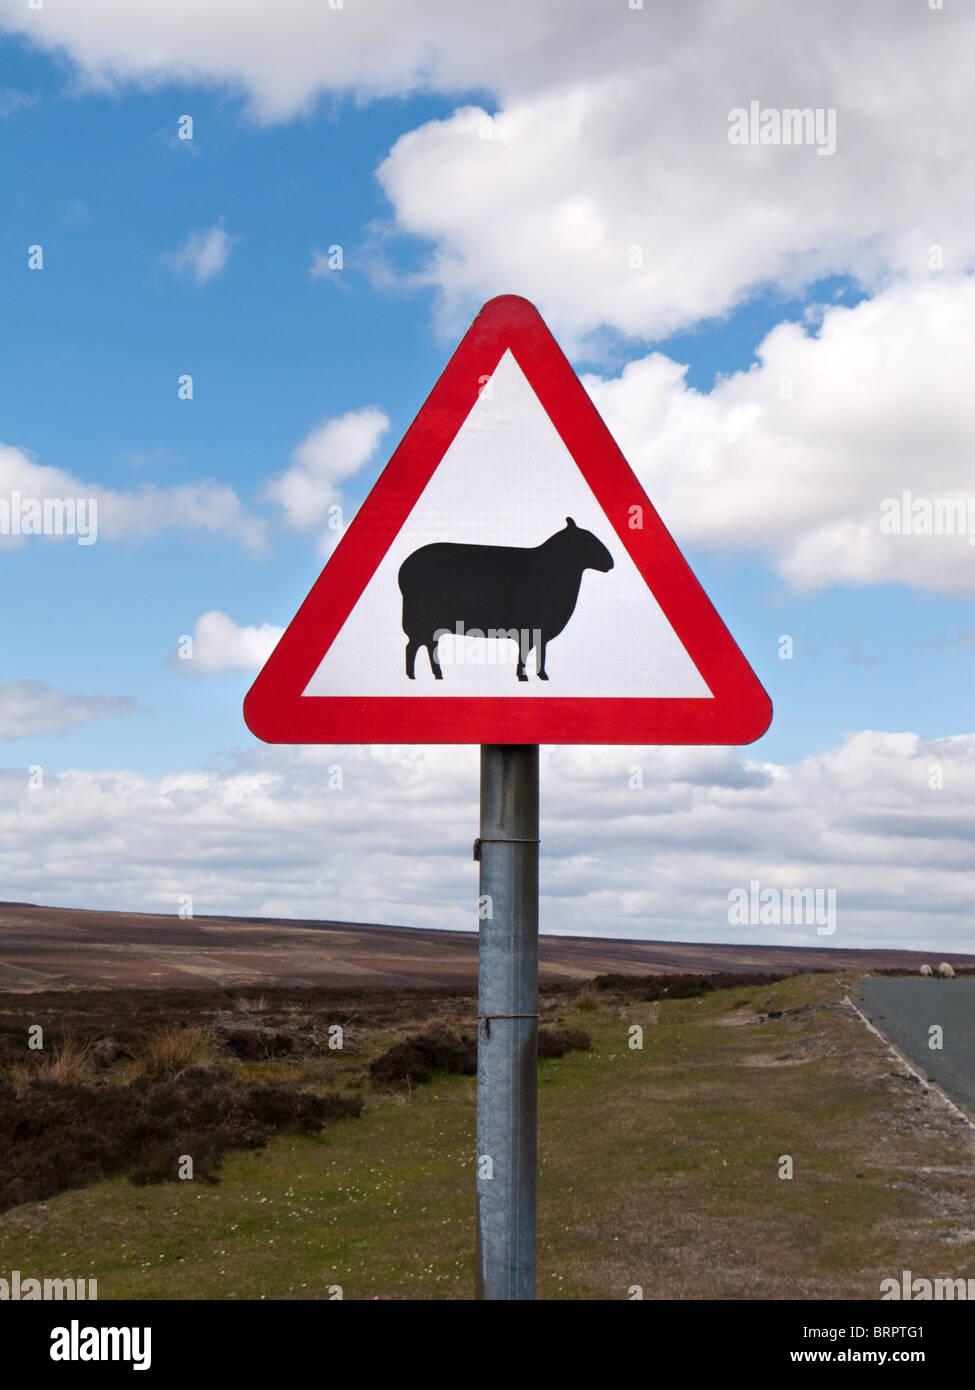 Road traffic sign warning sign of sheep ahead England UK - Stock Image